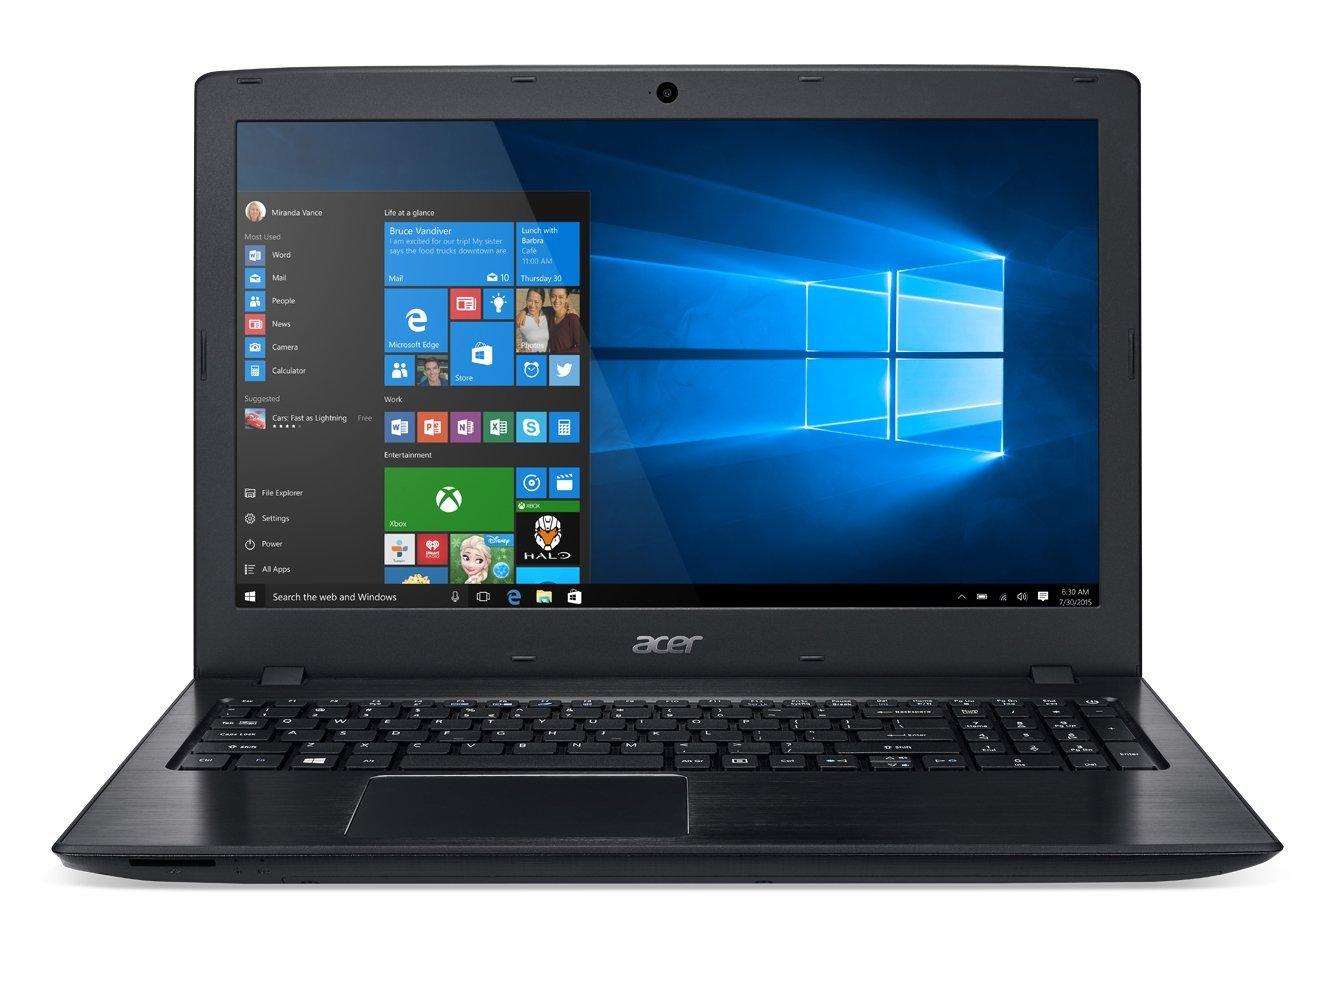 Acer Aspire E 15: 15.6'' FHD, i5-8250U Quad, 8GB DDR4, 256GB SSD, MX150 2GB, DVD-RW, Type-C, WIn10H @ $600 Back Order